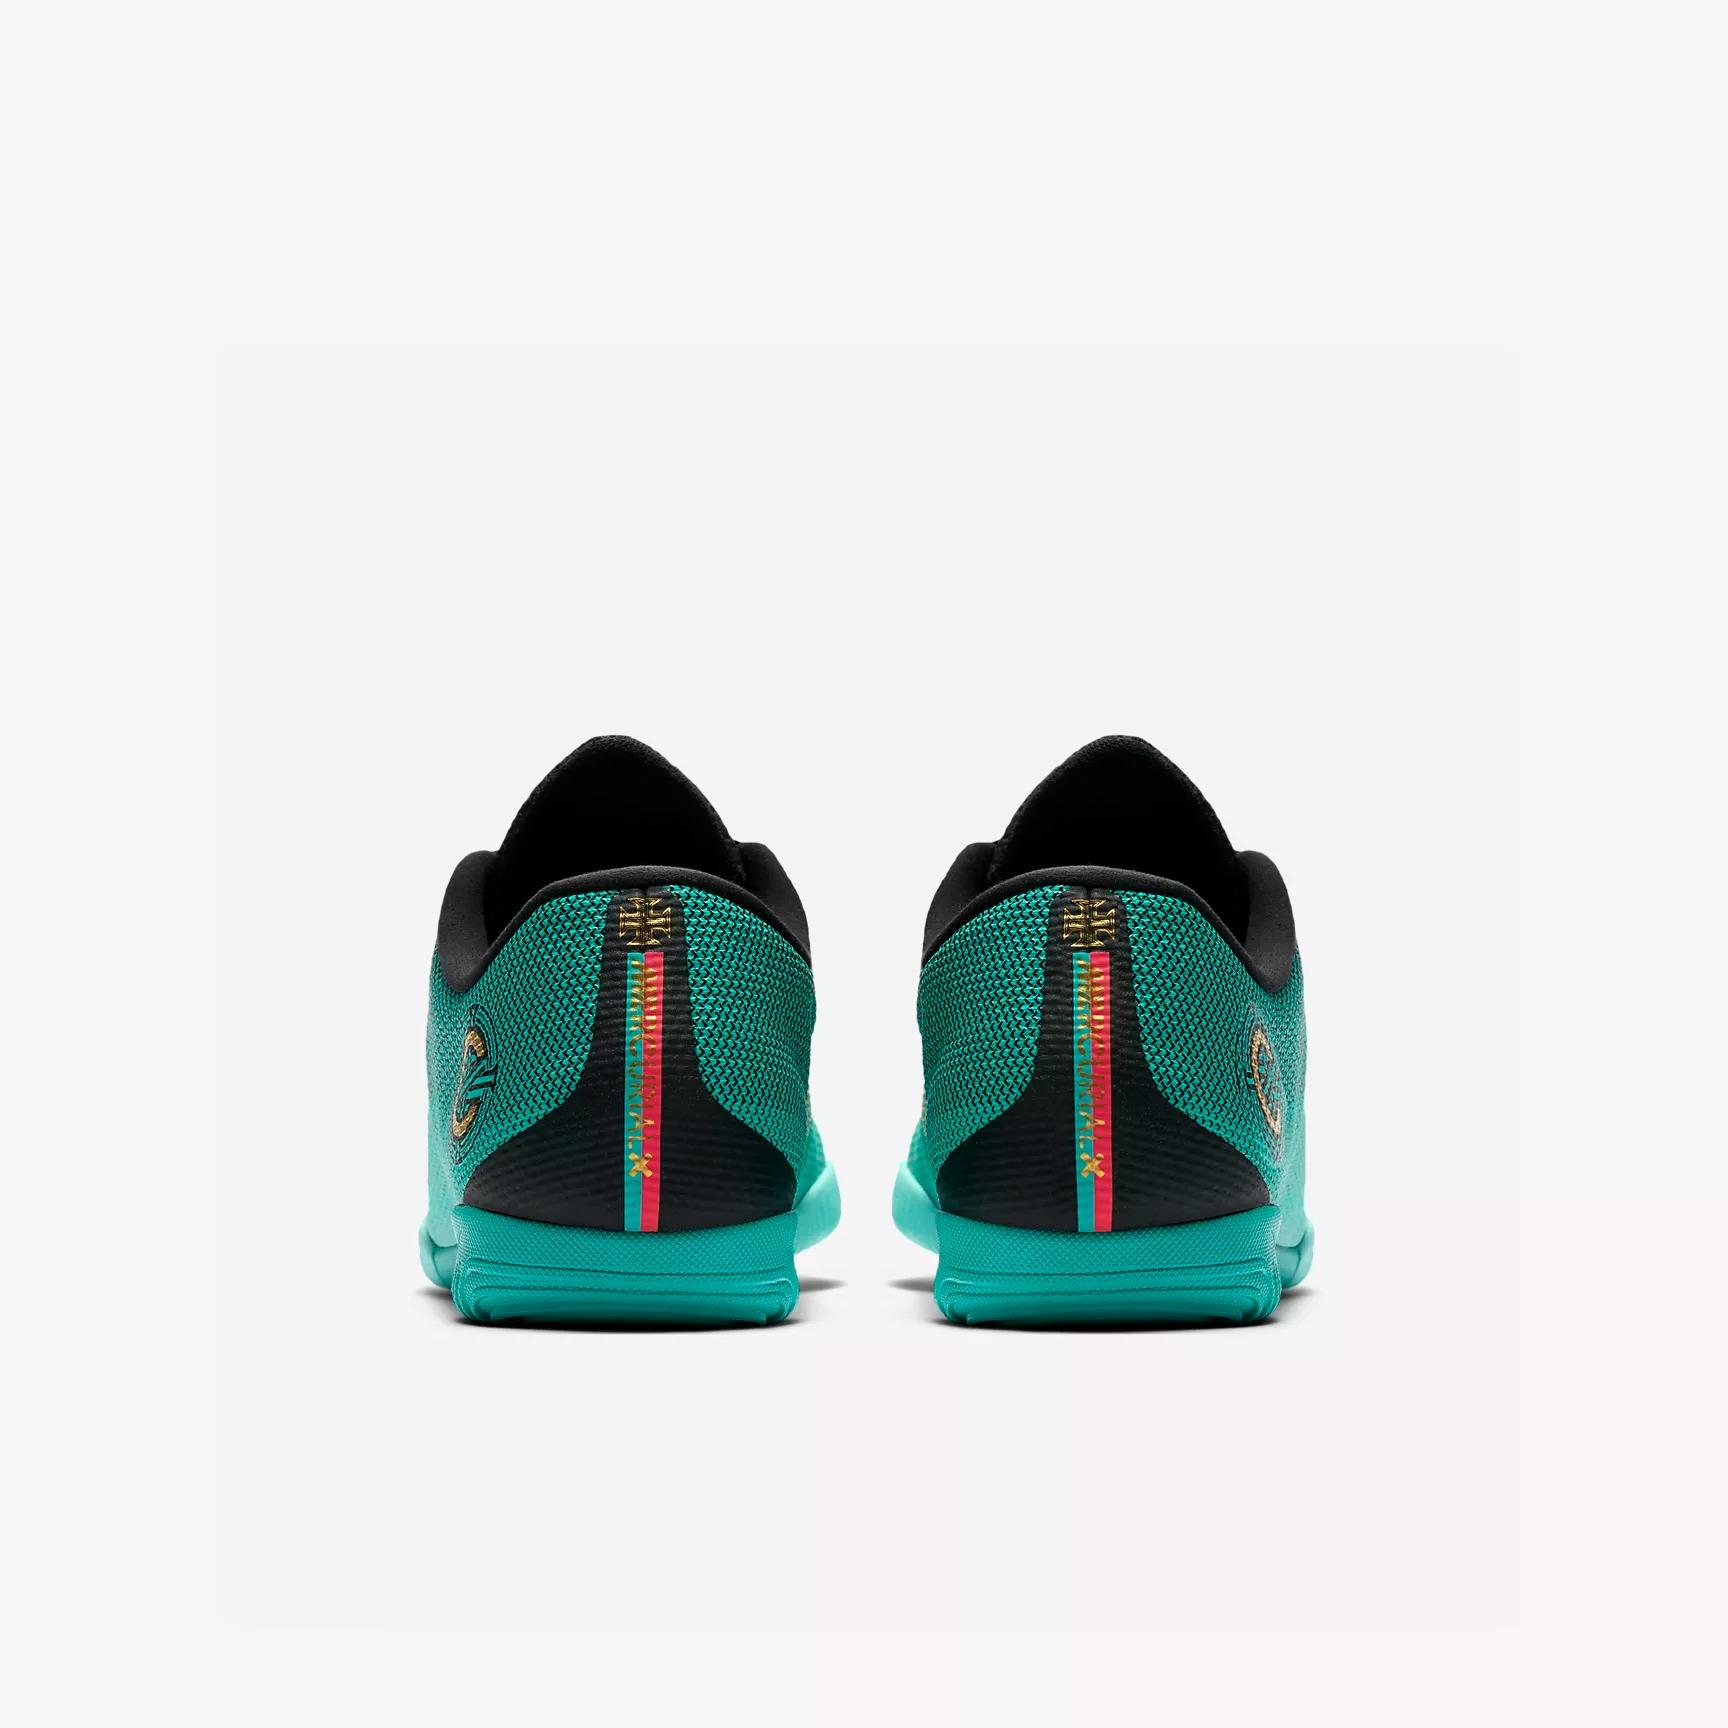 brand new 42d46 75b56 Nike MercurialX Vapor XII Academy CR7 IC Soccer Cleats